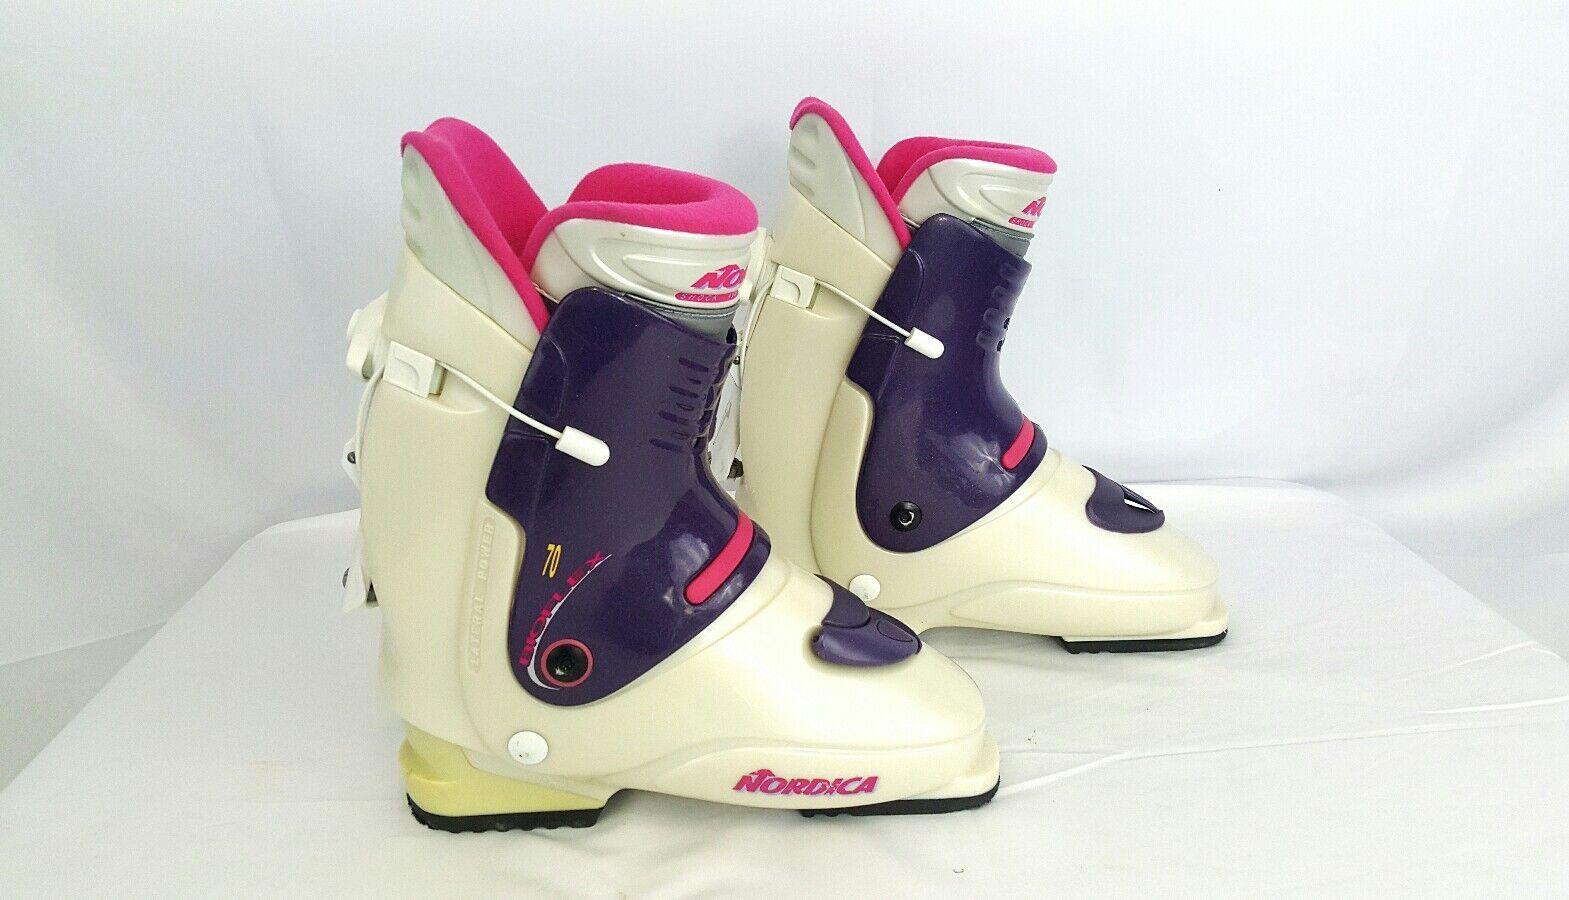 NORDICA BIOFLEX 70  Downhill Ski Boots, Women's 26.0 260 265 mm White Purple